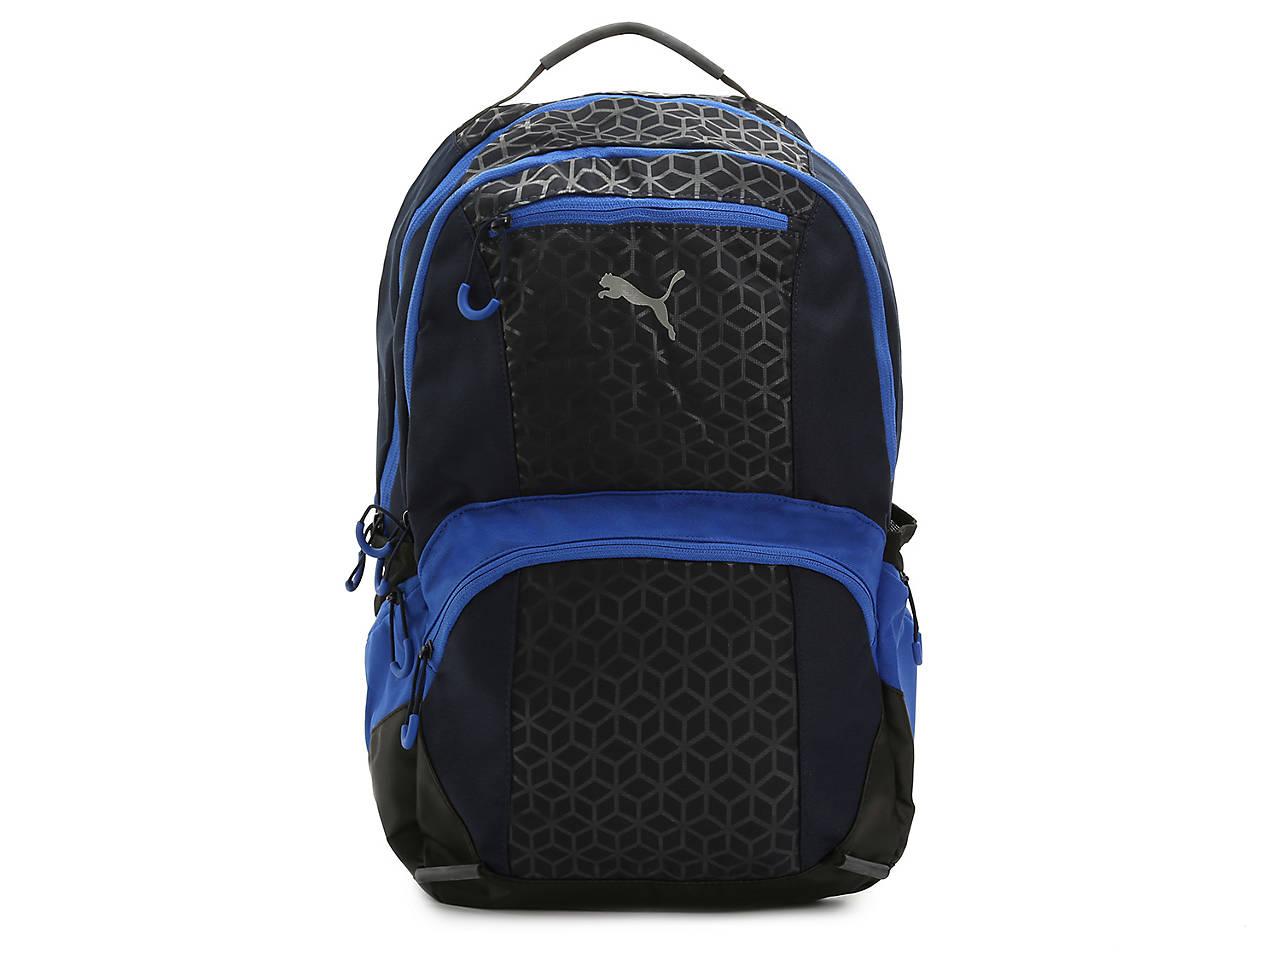 99a4f37b29a45e Puma Evolve Backpack Men's Handbags & Accessories   DSW